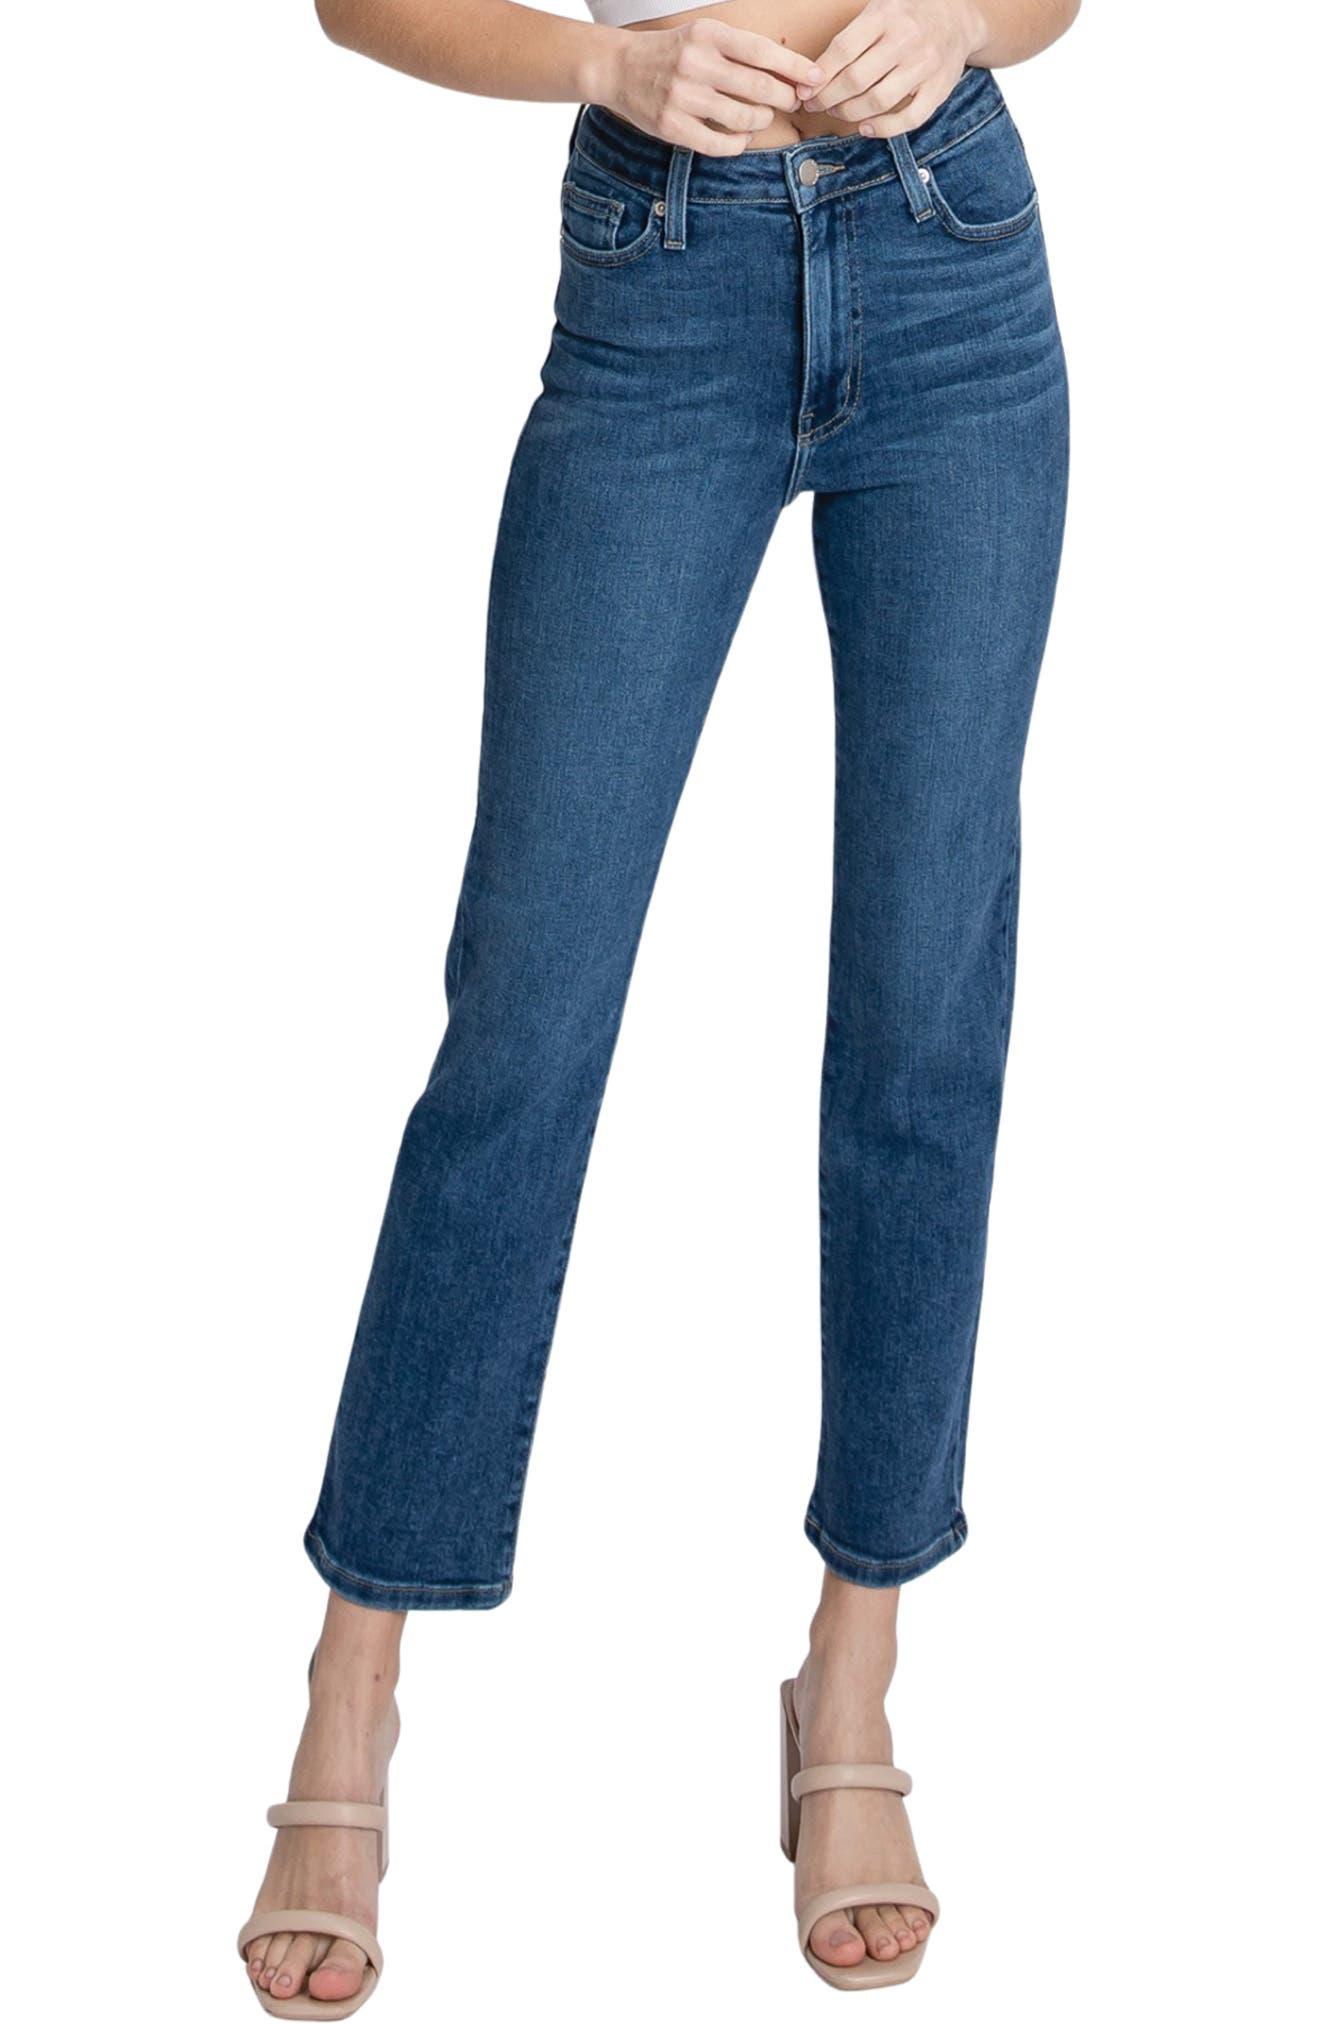 Sienna High Waist Straight Leg Ankle Jeans